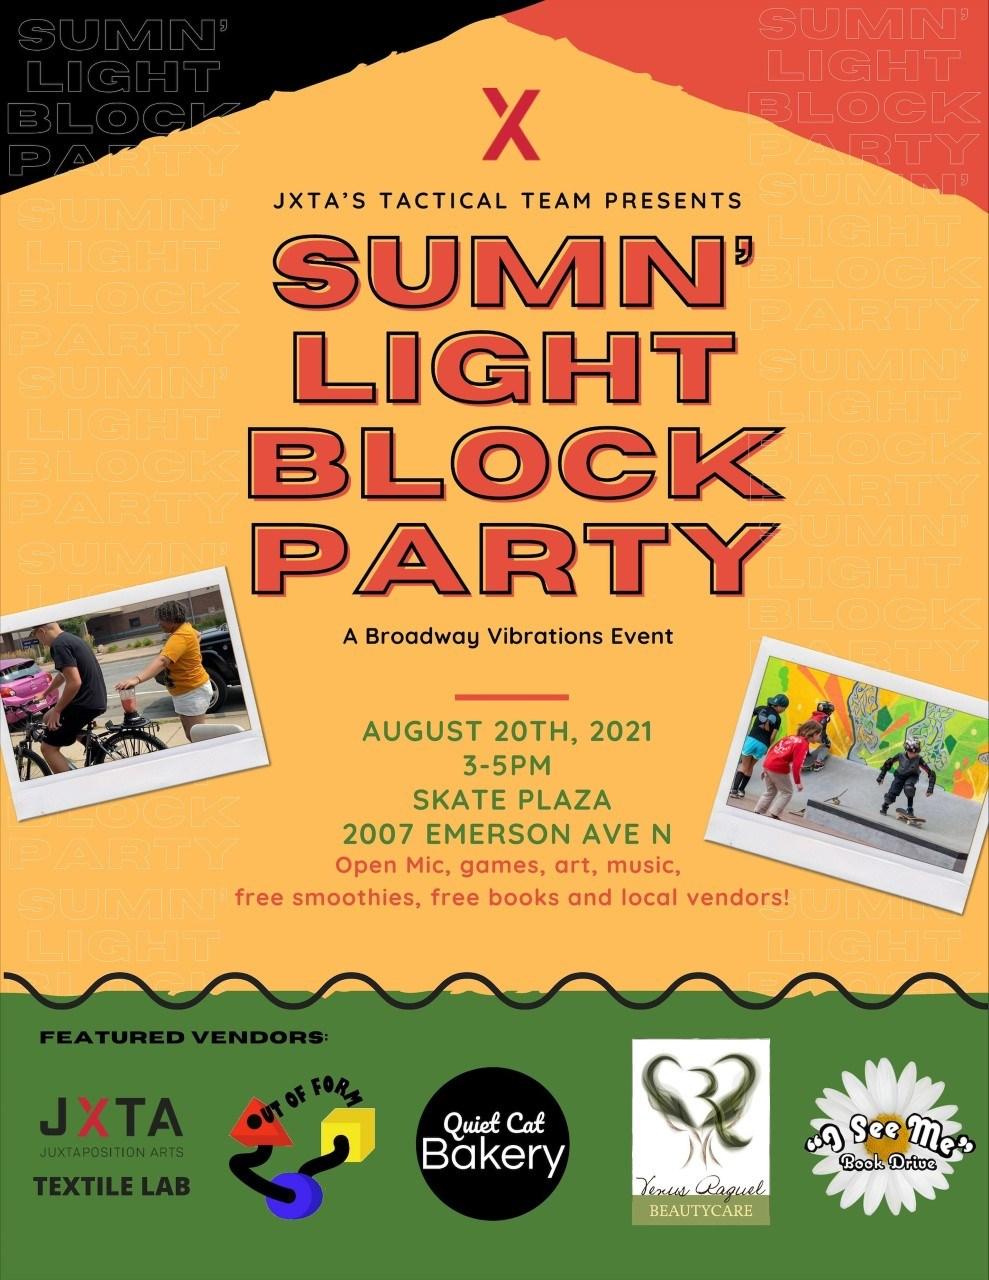 Sumn' Light Block Party image